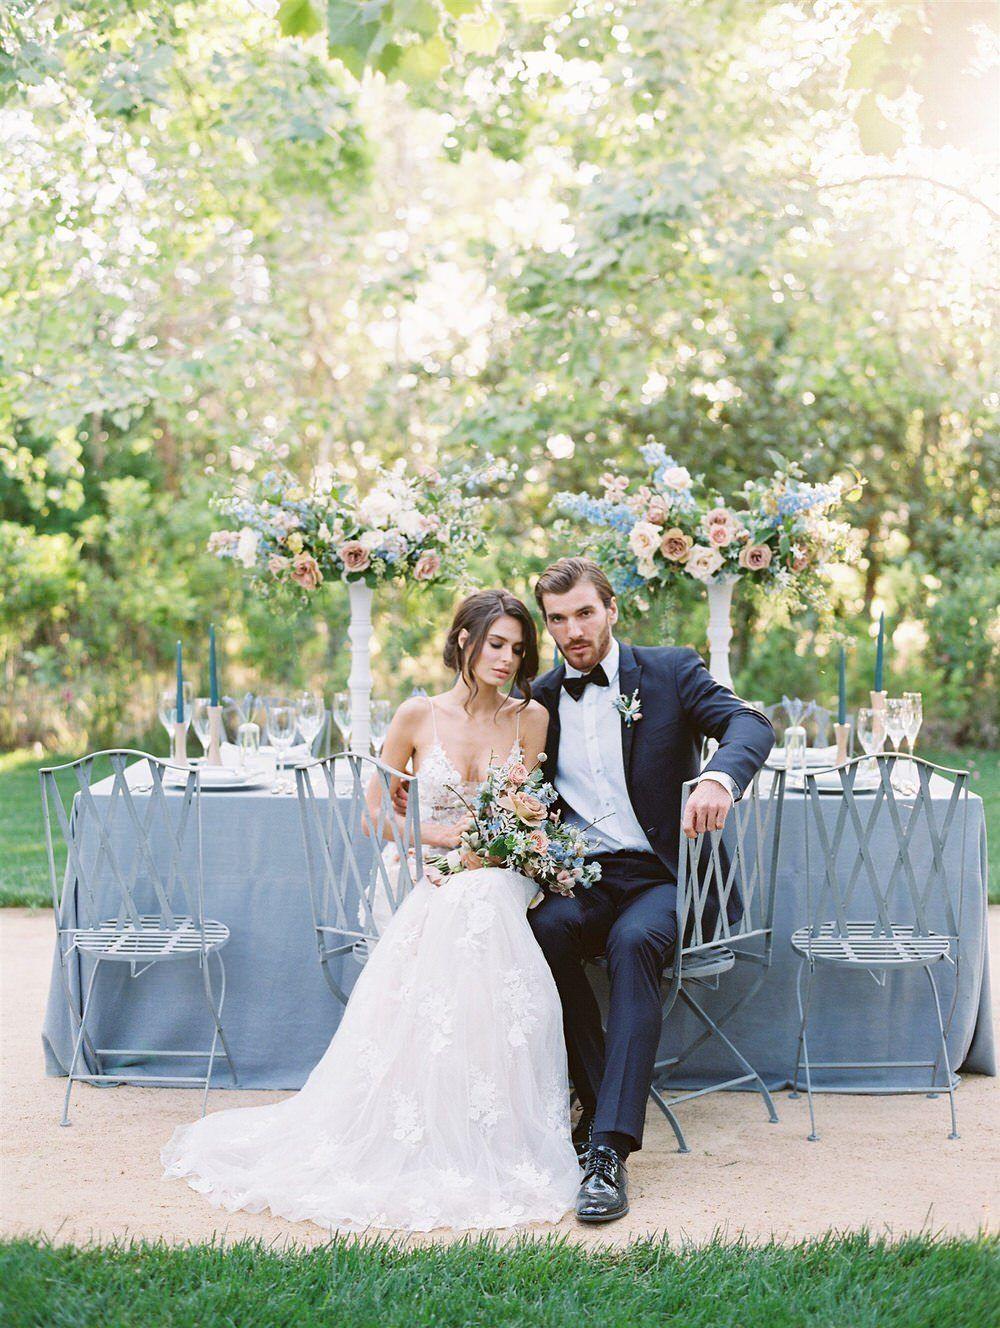 Ultra Romantic Micro Wedding at Kestrel Park in Santa Ynez